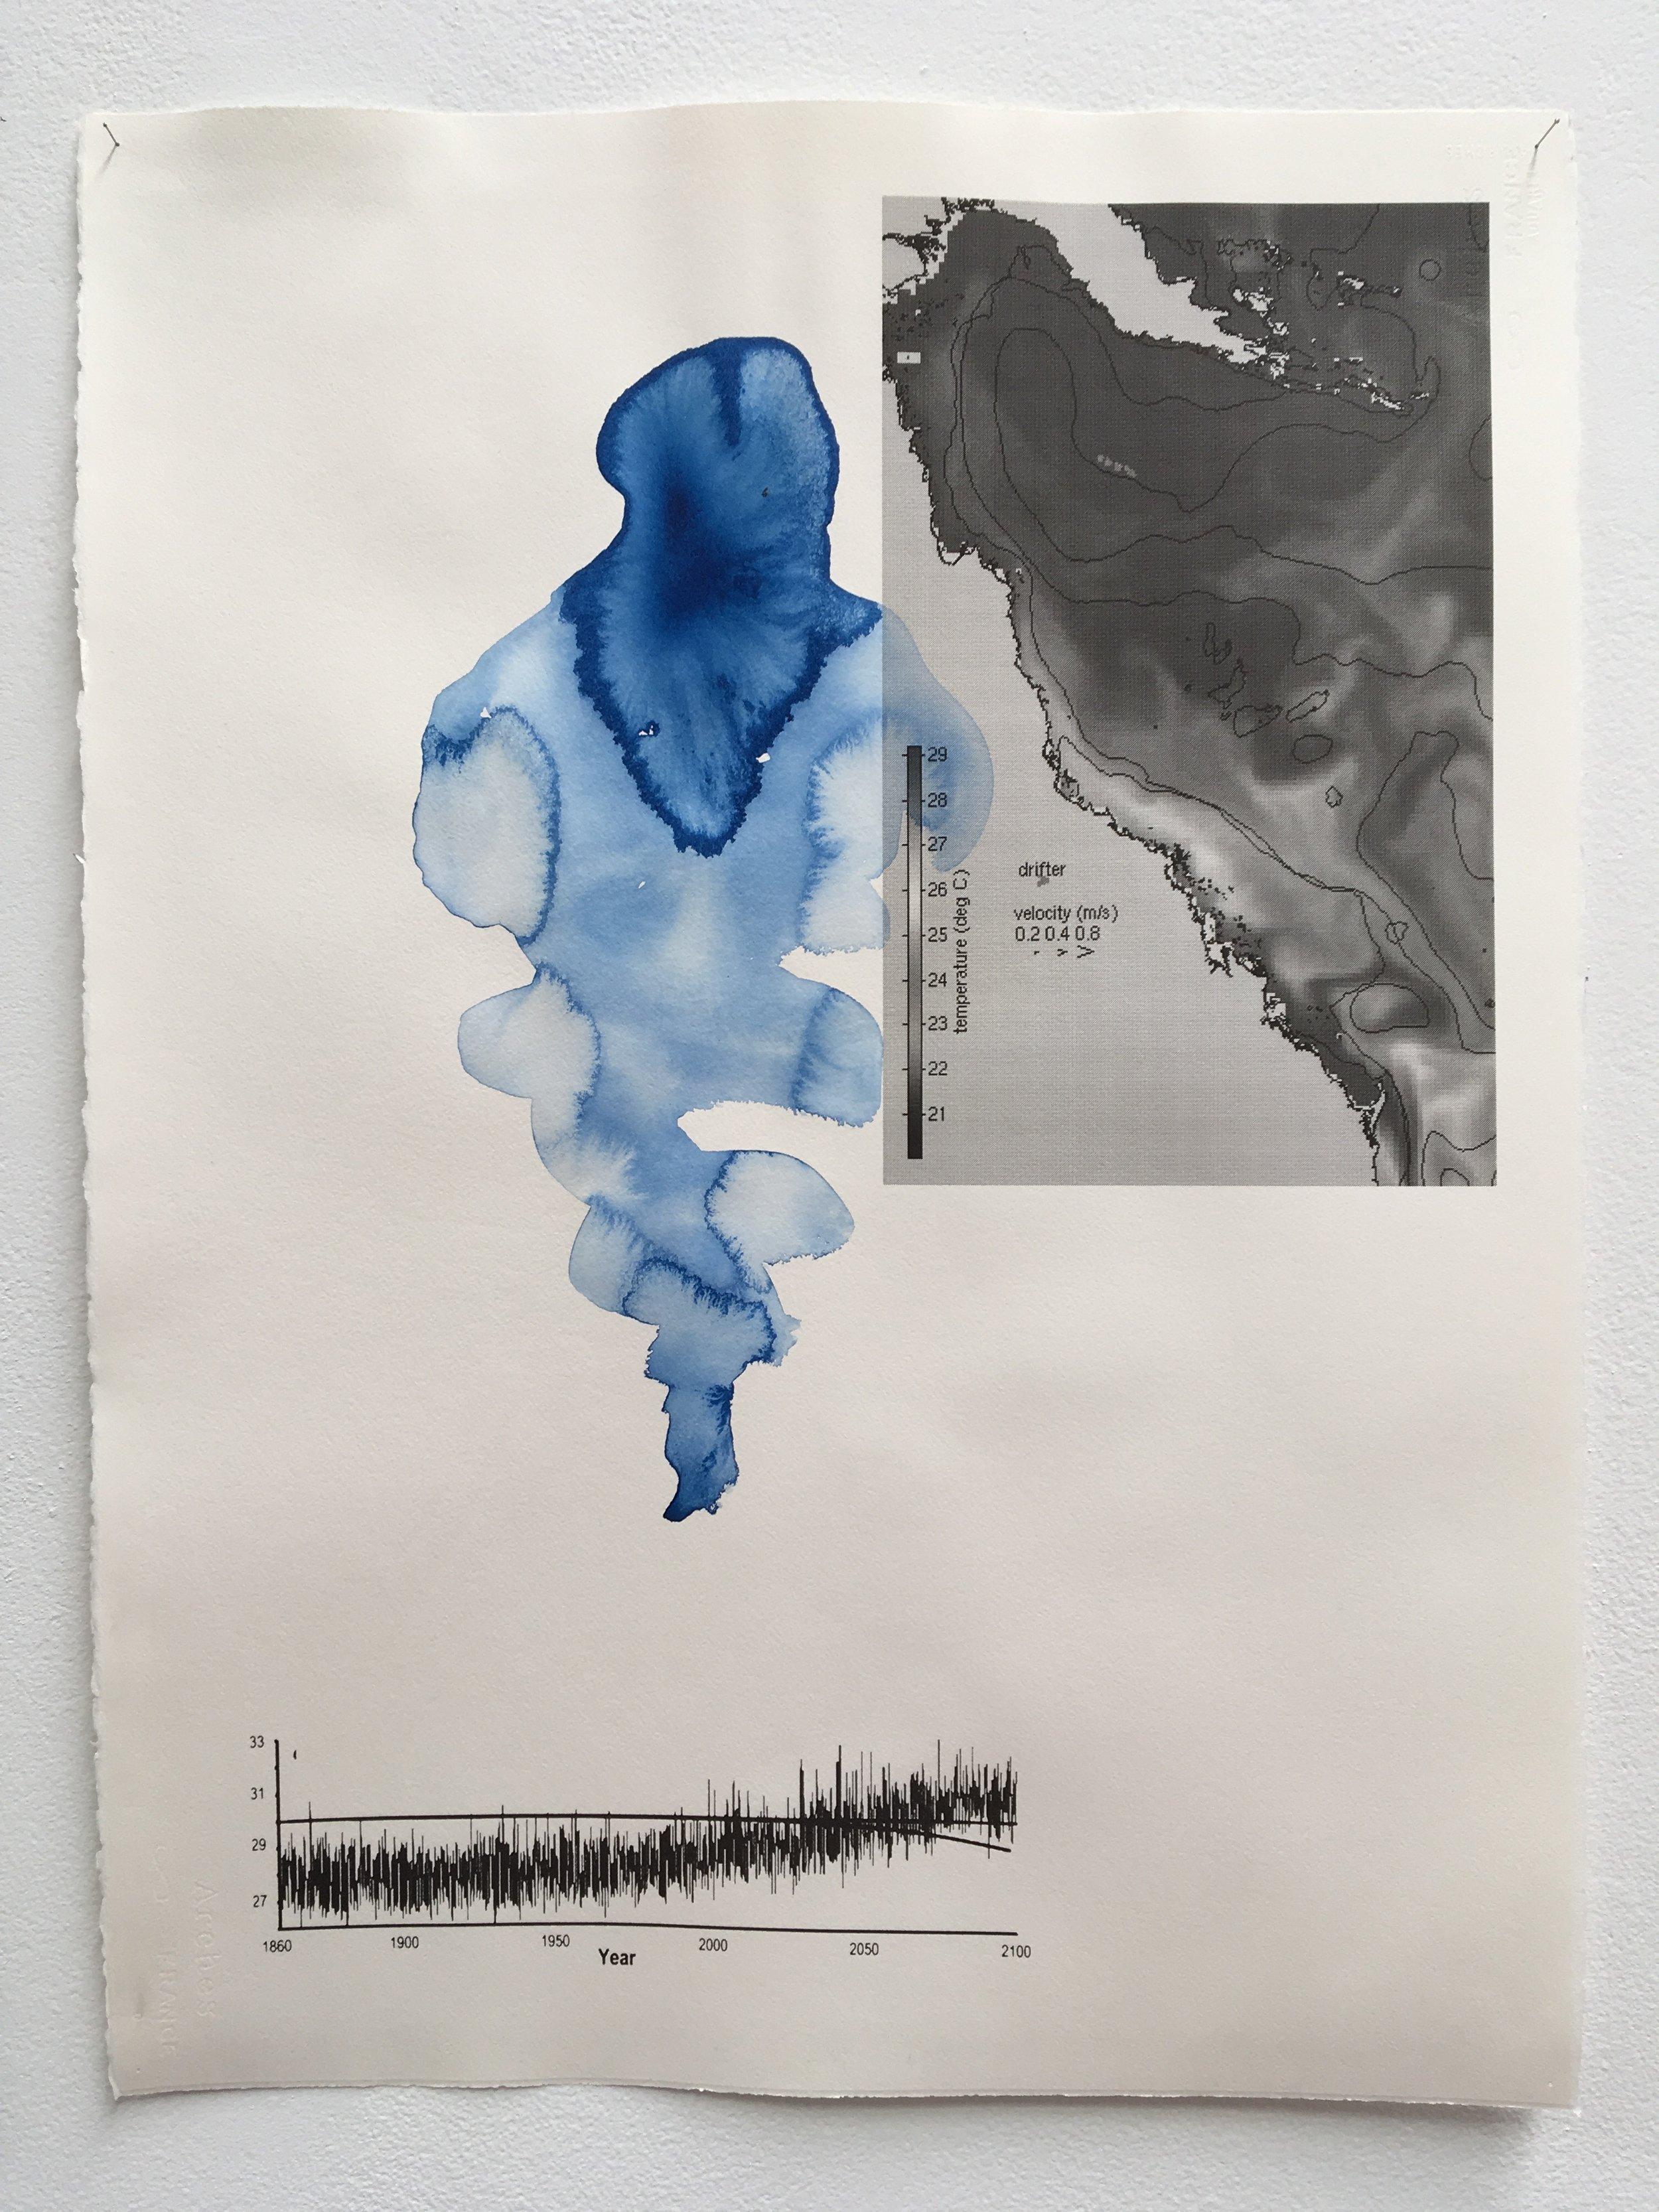 Judy Watson heron island 7 2009-16 acrylic and digital print on paper 77 x 57 cm.jpg